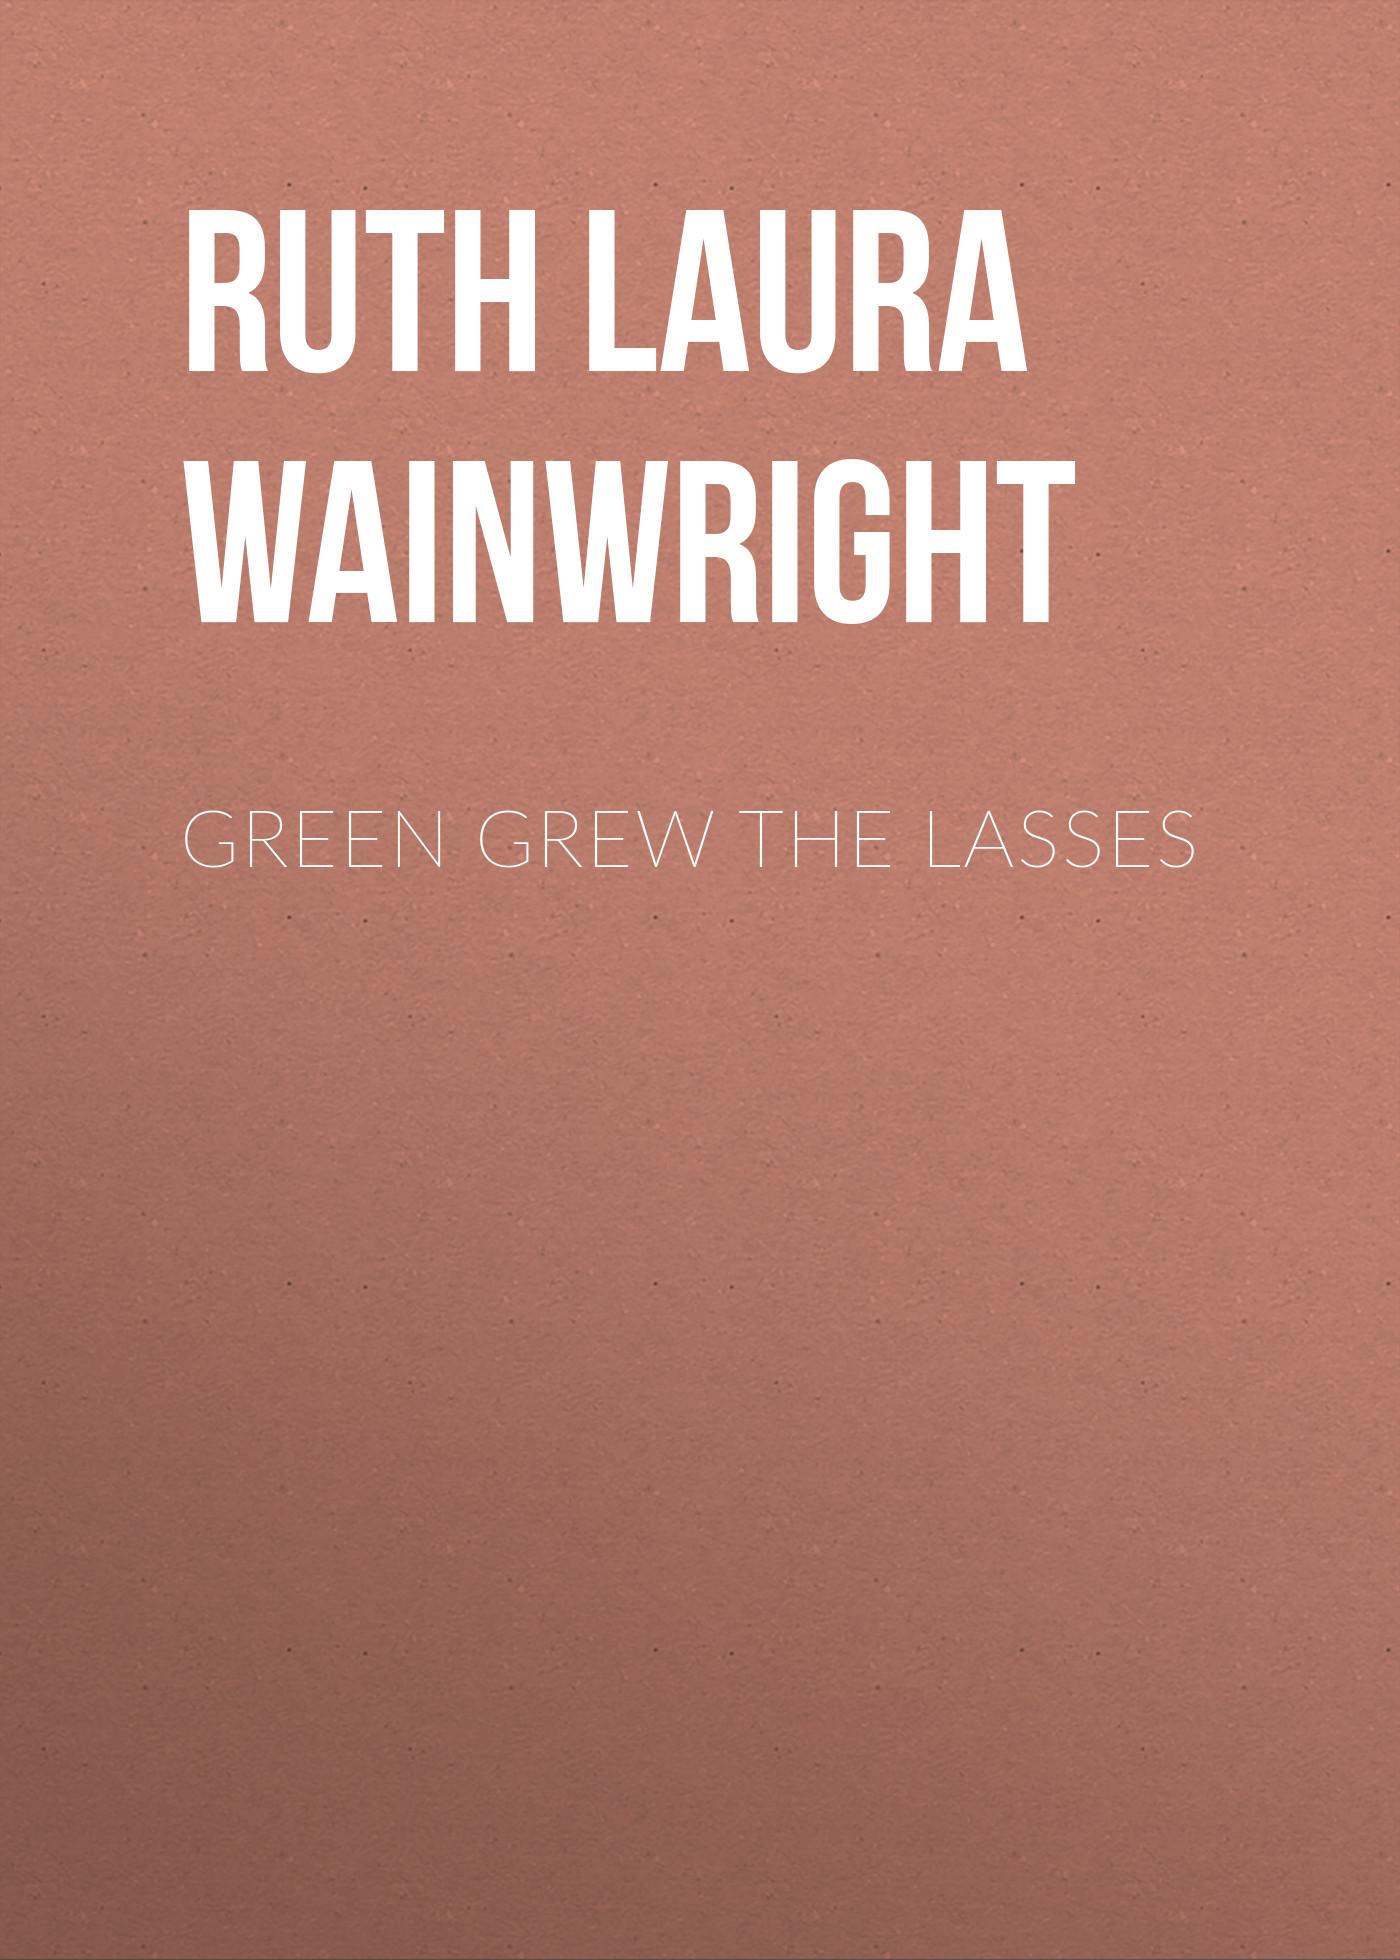 Ruth Laura Wainwright Green Grew the Lasses цены онлайн